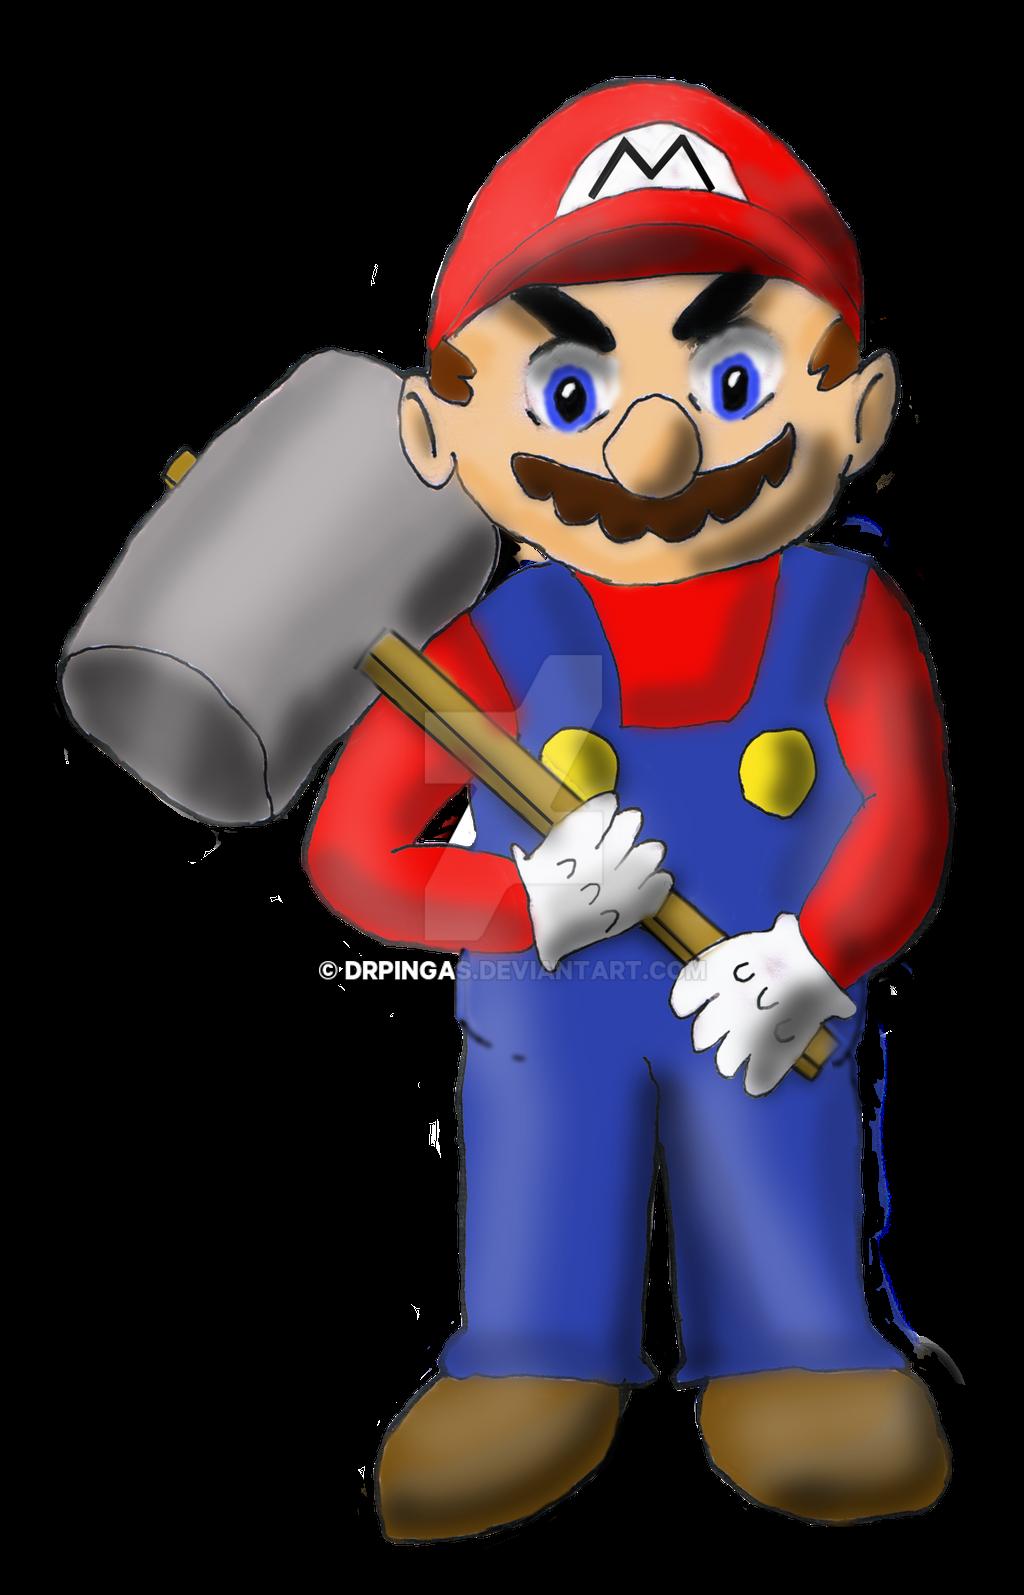 Mario Kingdom Hearts Jurassic Revolution rpgmaker by DrPingas